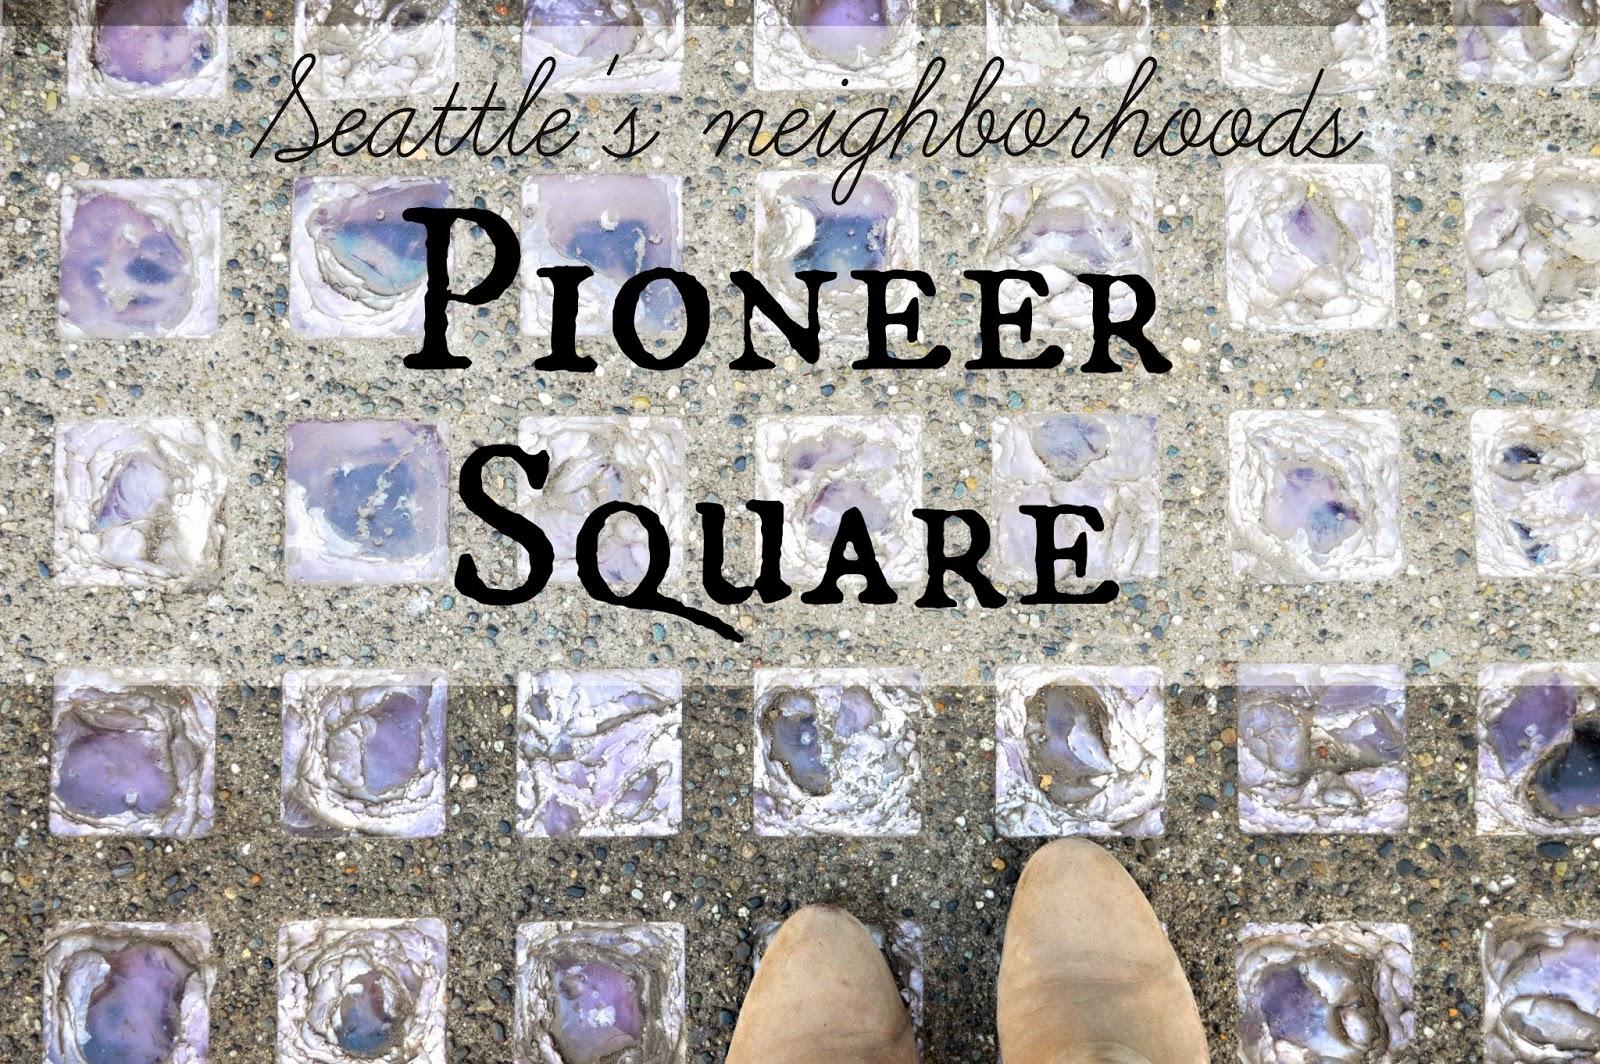 Skylights sidewalks. Pioneer Square. Seattle